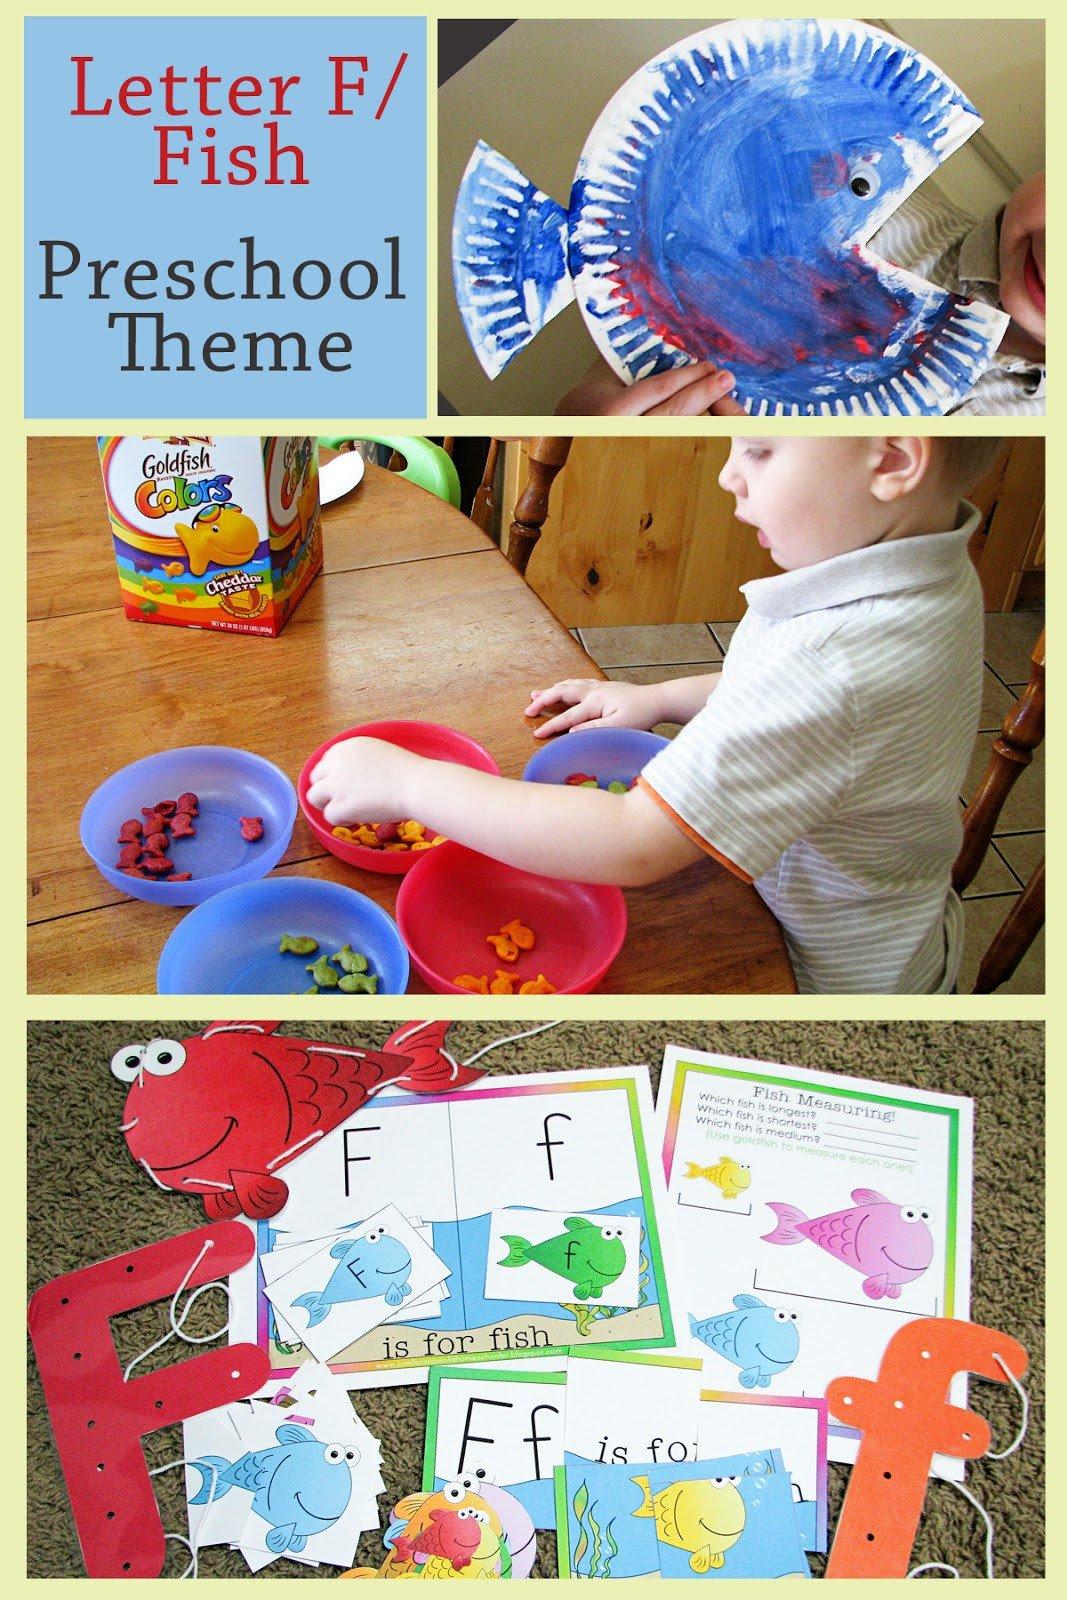 Preschool Fish theme Mommy S Little Helper Letter F Fish Preschool theme